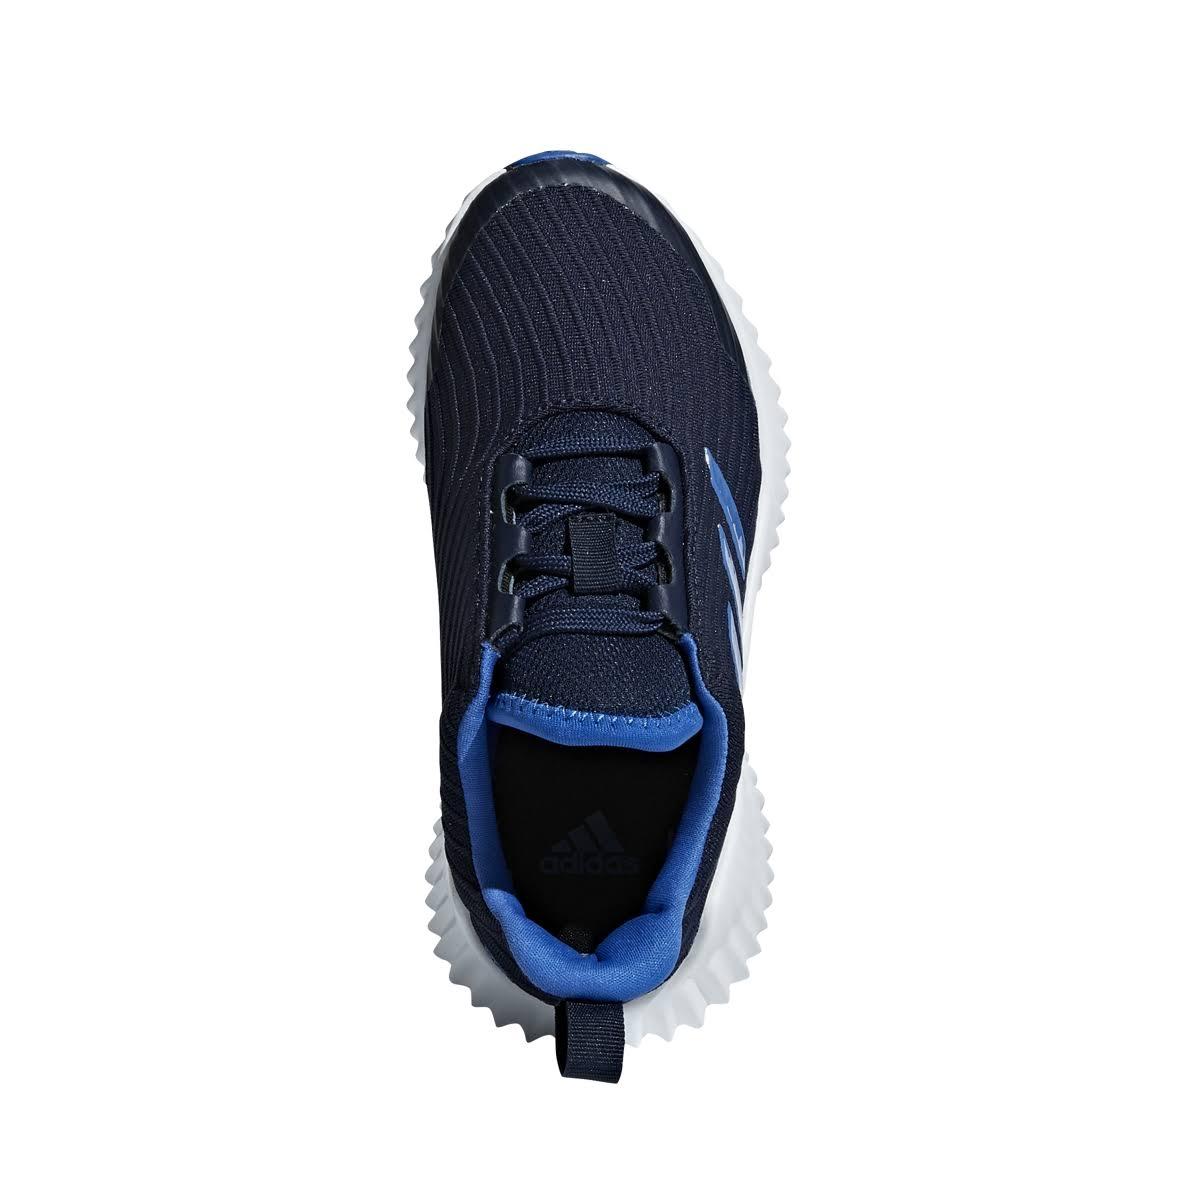 K Adidas Running Niños Fortarun Azul 3 Para Zapatillas Negro Ah2620 De 6ZgqwI